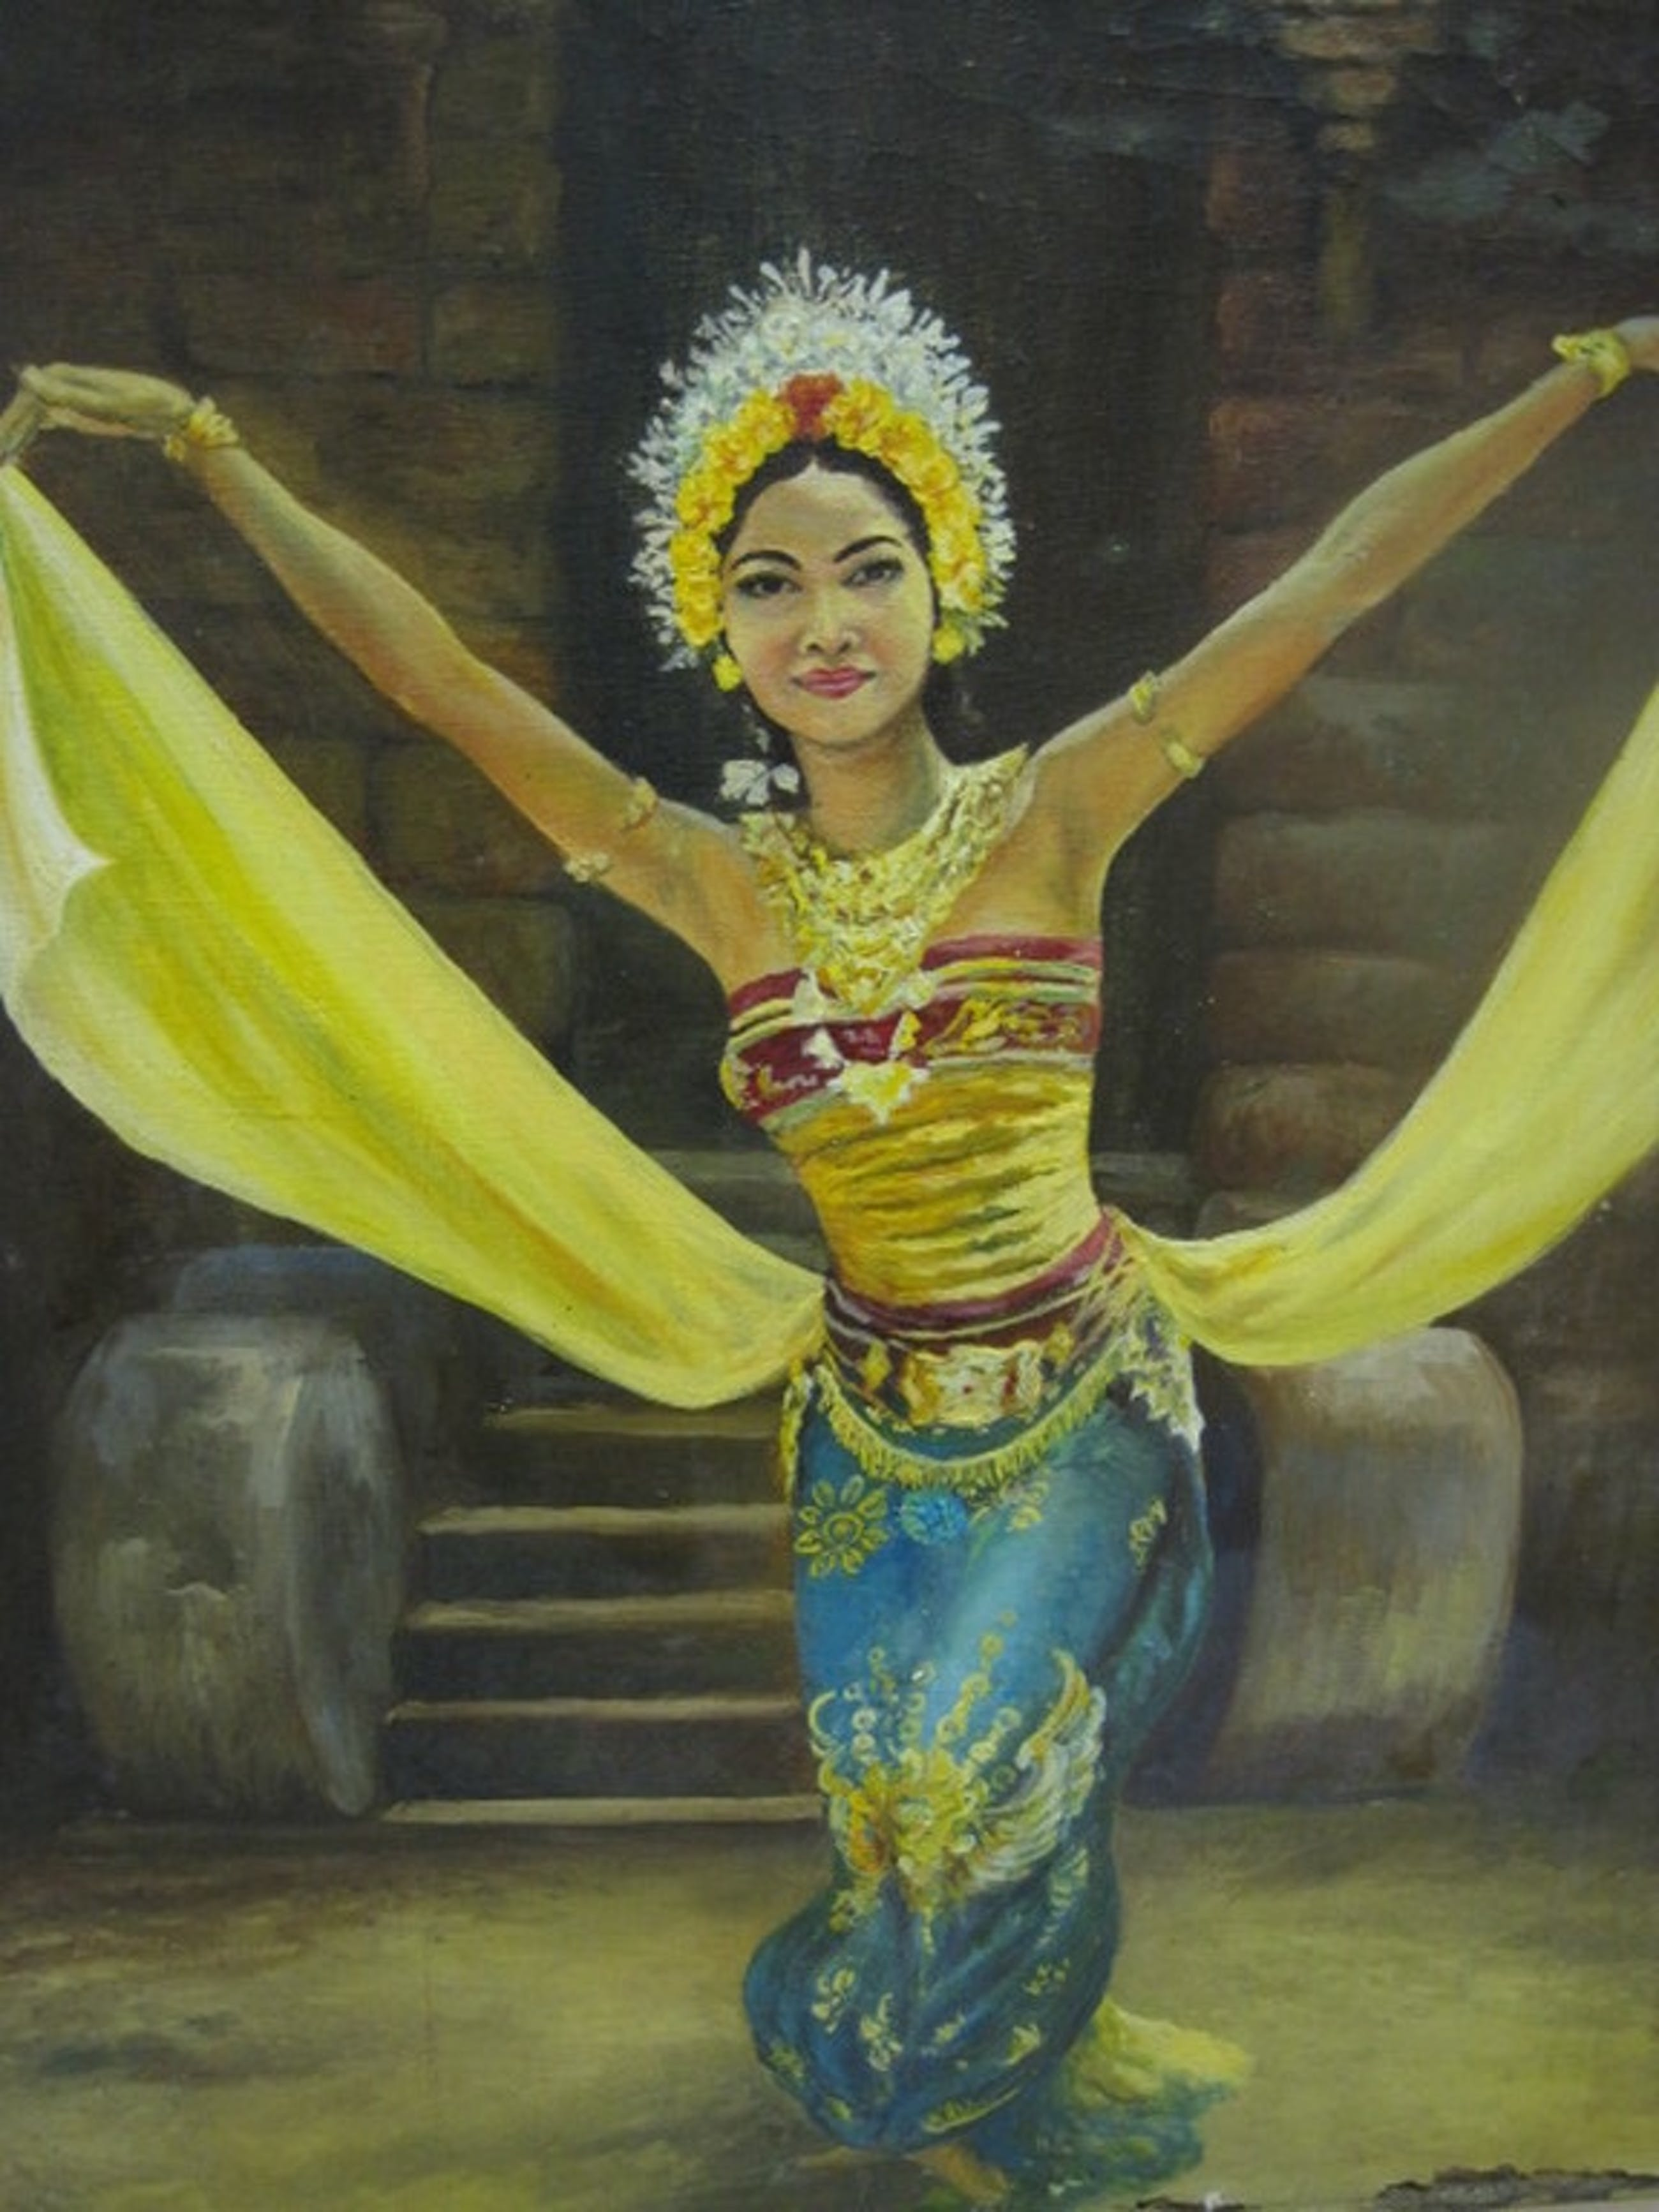 gesigneerd F.Eekhout olieverf Indonesie Bali danseres ca. 1920 kopen? Bied vanaf 1!